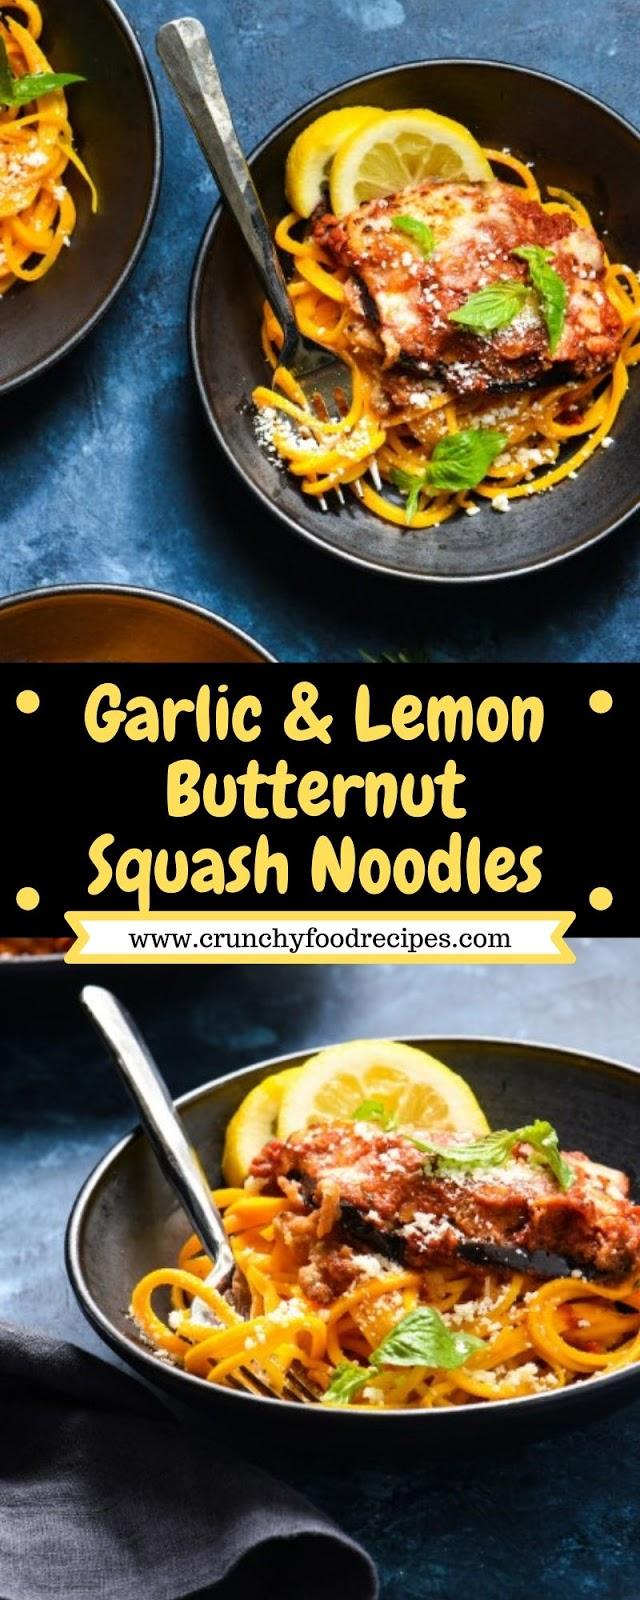 Garlic & Lemon Butternut Squash Noodles